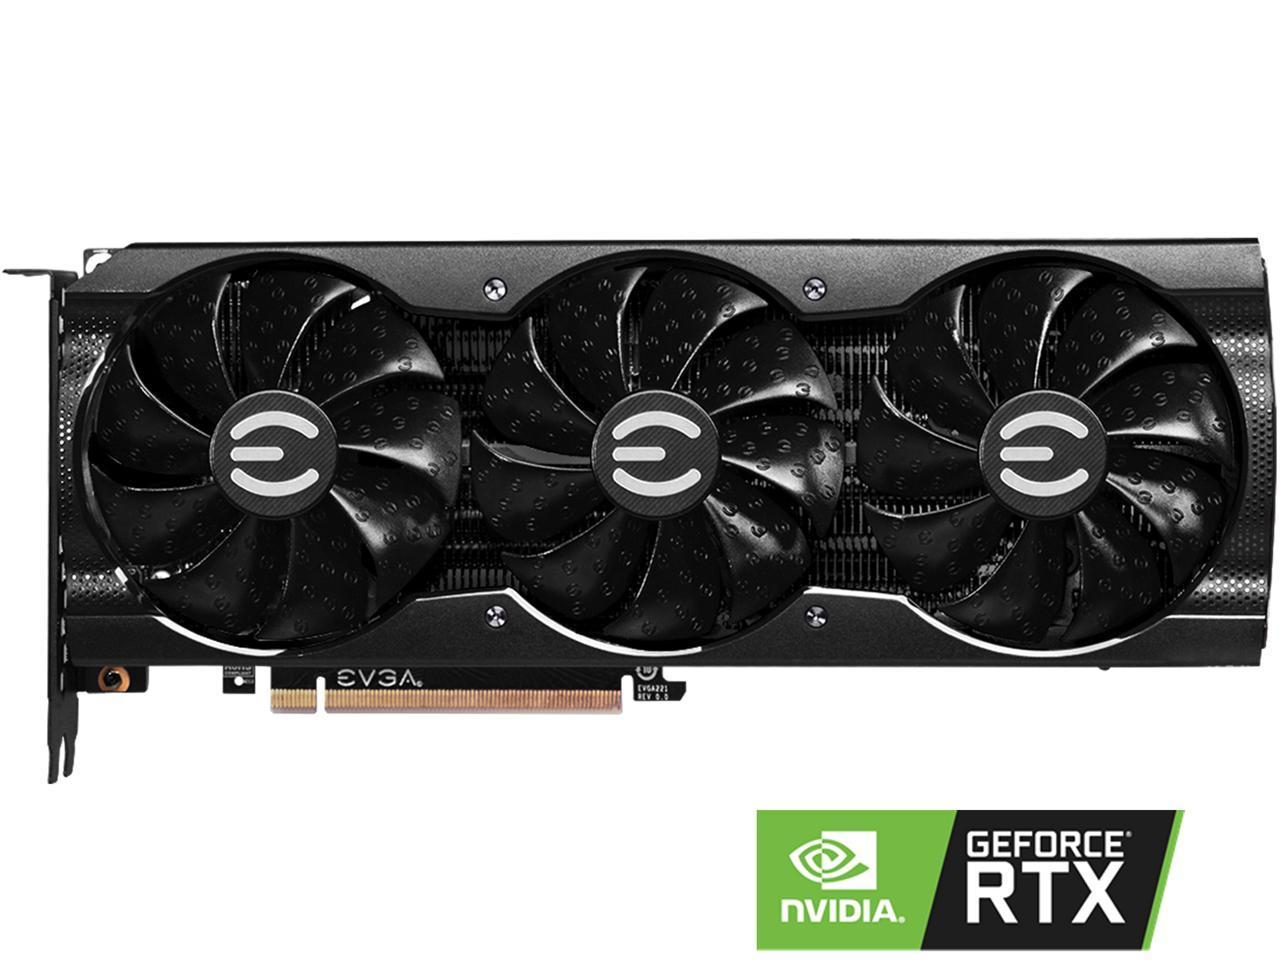 EVGA GeForce RTX 3070 XC3 BLACK GAMING Video Card, 08G-P5-3751-KR, 8GB GDDR6, iCX3 Cooling, ARGB LE